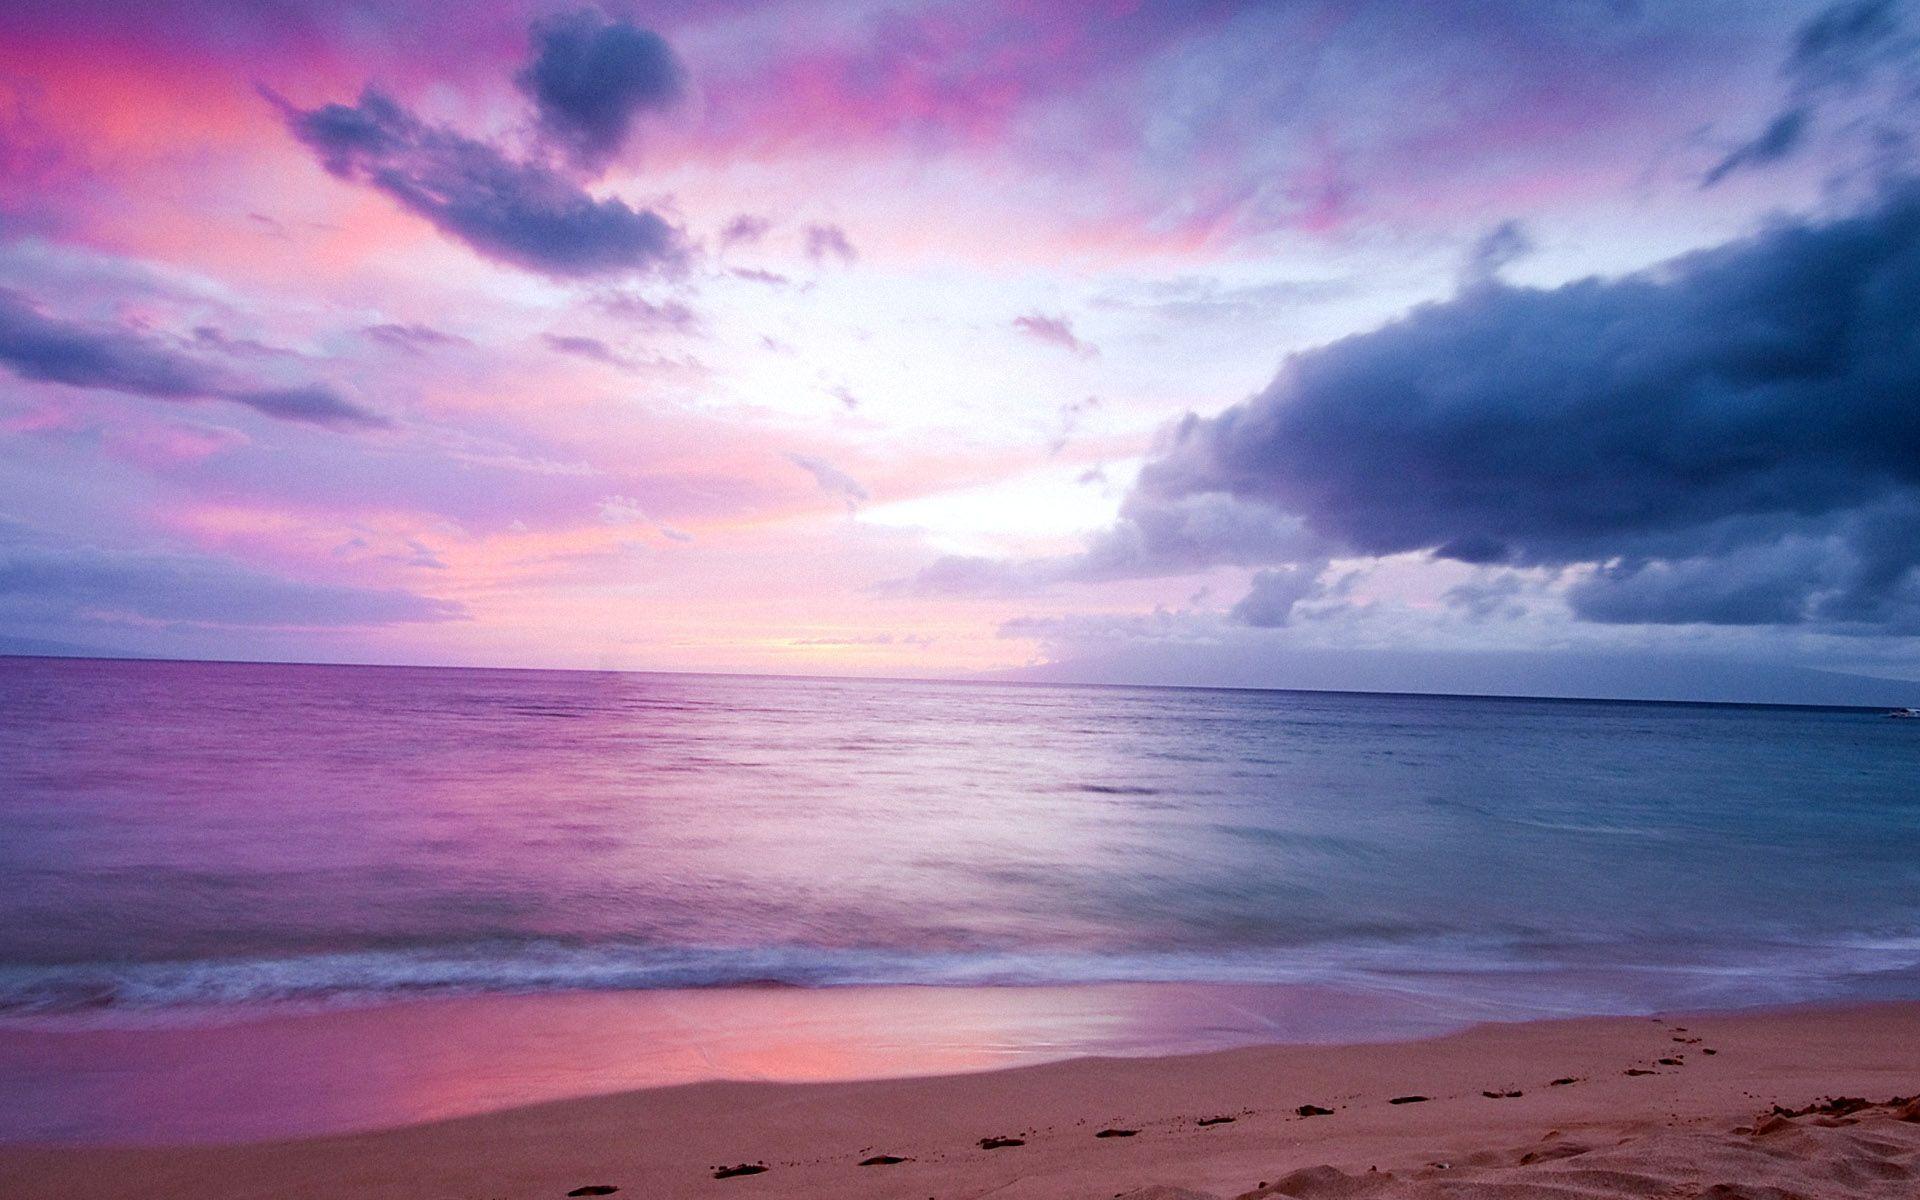 Purple Landscape Photos Yahoo Image Search Results Beach Sunset Wallpaper Sunset Wallpaper Beach Wallpaper